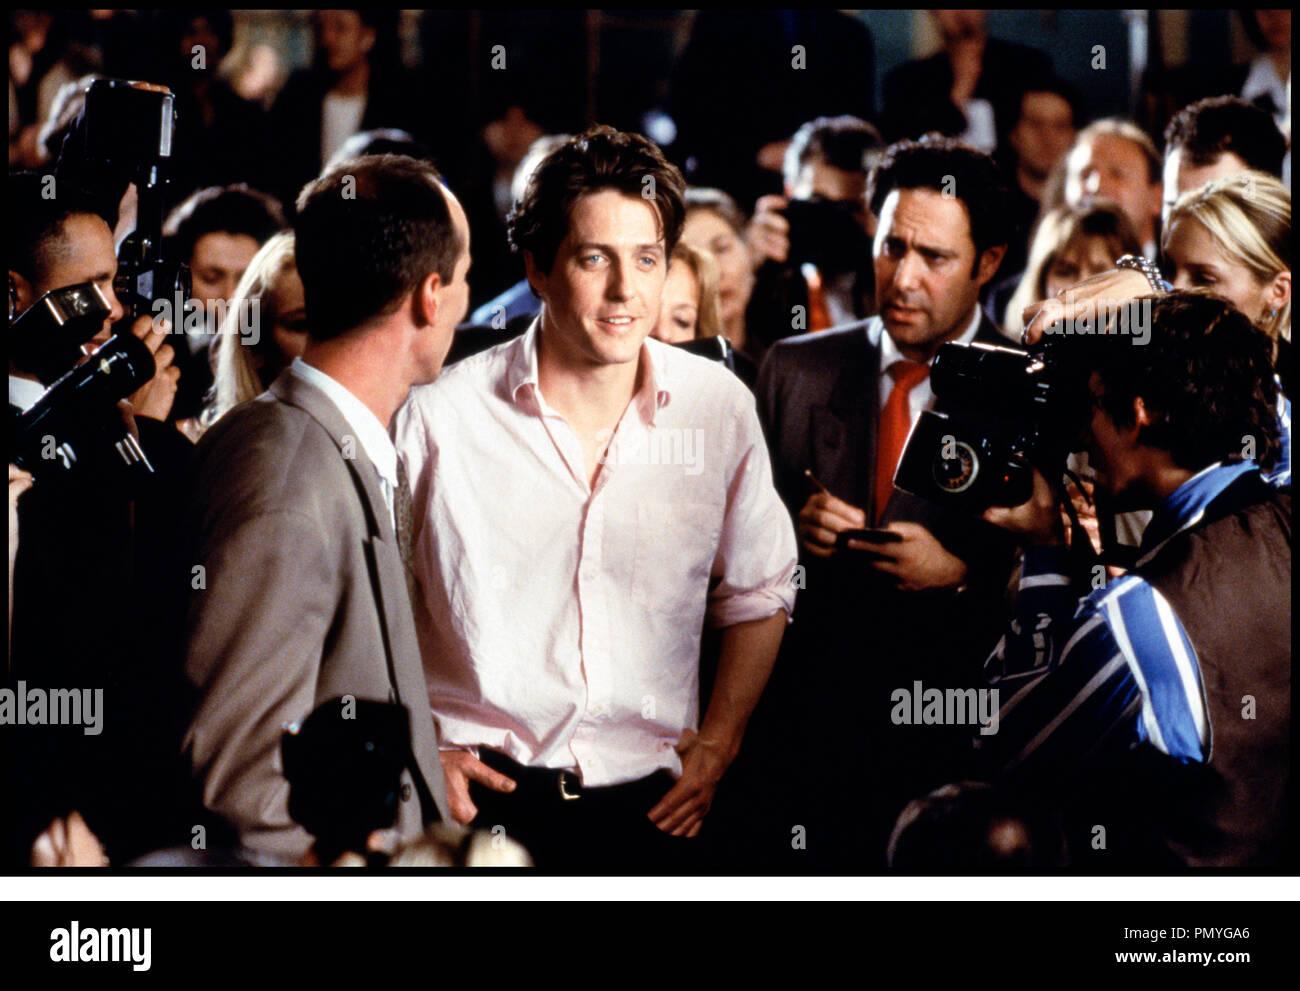 Prod DB © PolyGram - Working Title / DR COUP DE FOUDRE A NOTTING HILL (NOTTING HILL) de Roger Michell 1999 GB avec Hugh Grant paparazzi, medias, journalistes, star, celebrite, harcelement - Stock Image